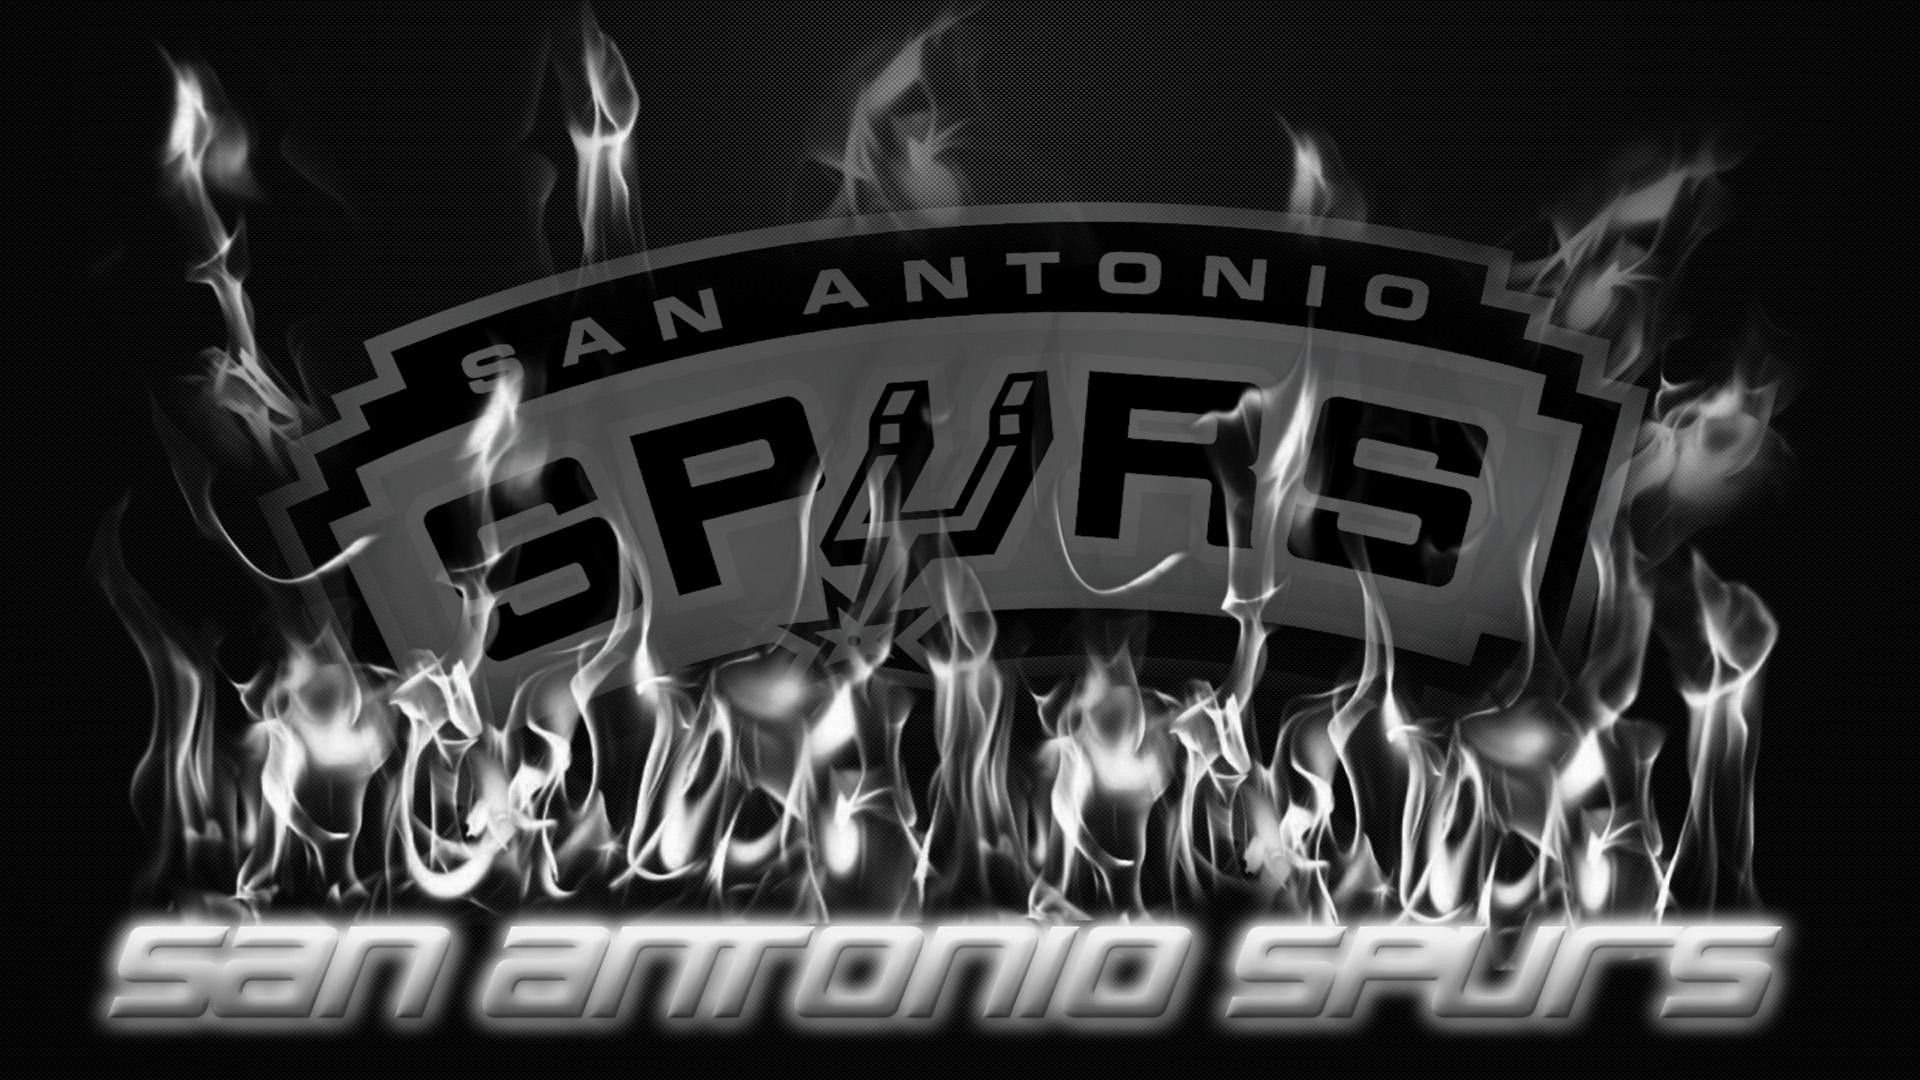 San Antonio Spurs HD 1080 wallpaper